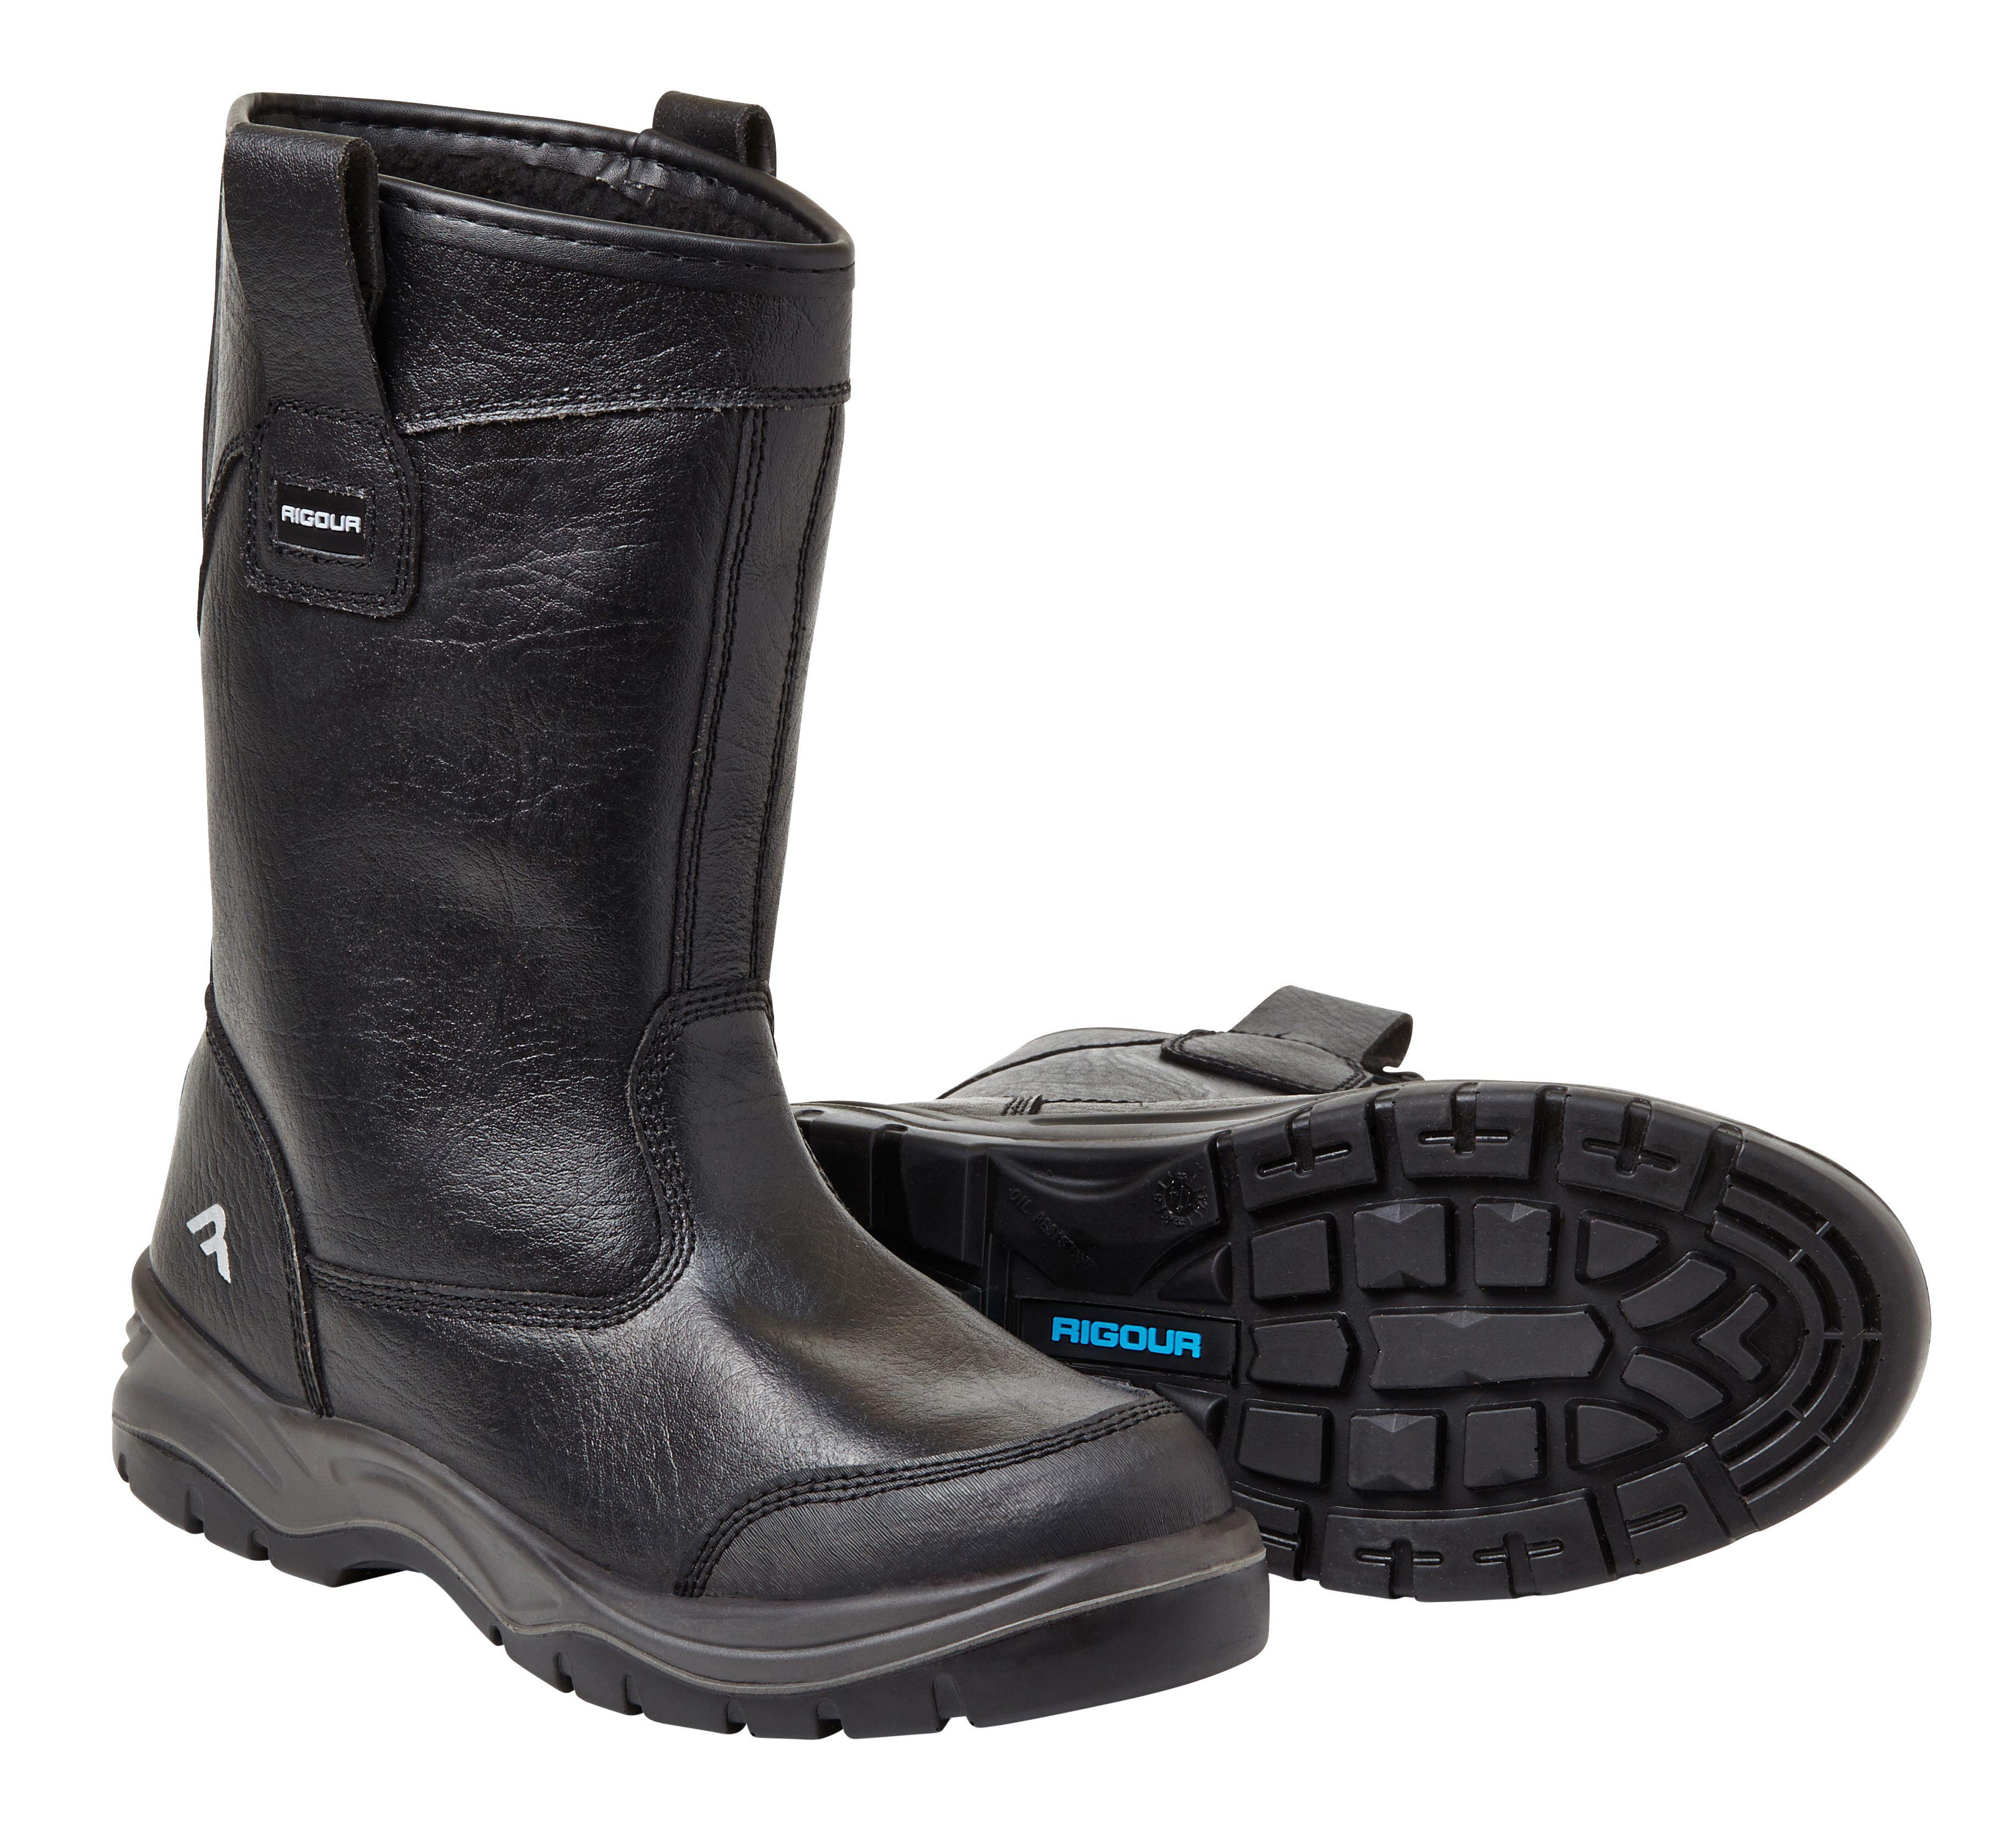 Rigour Black Rigger Boots, Size 10